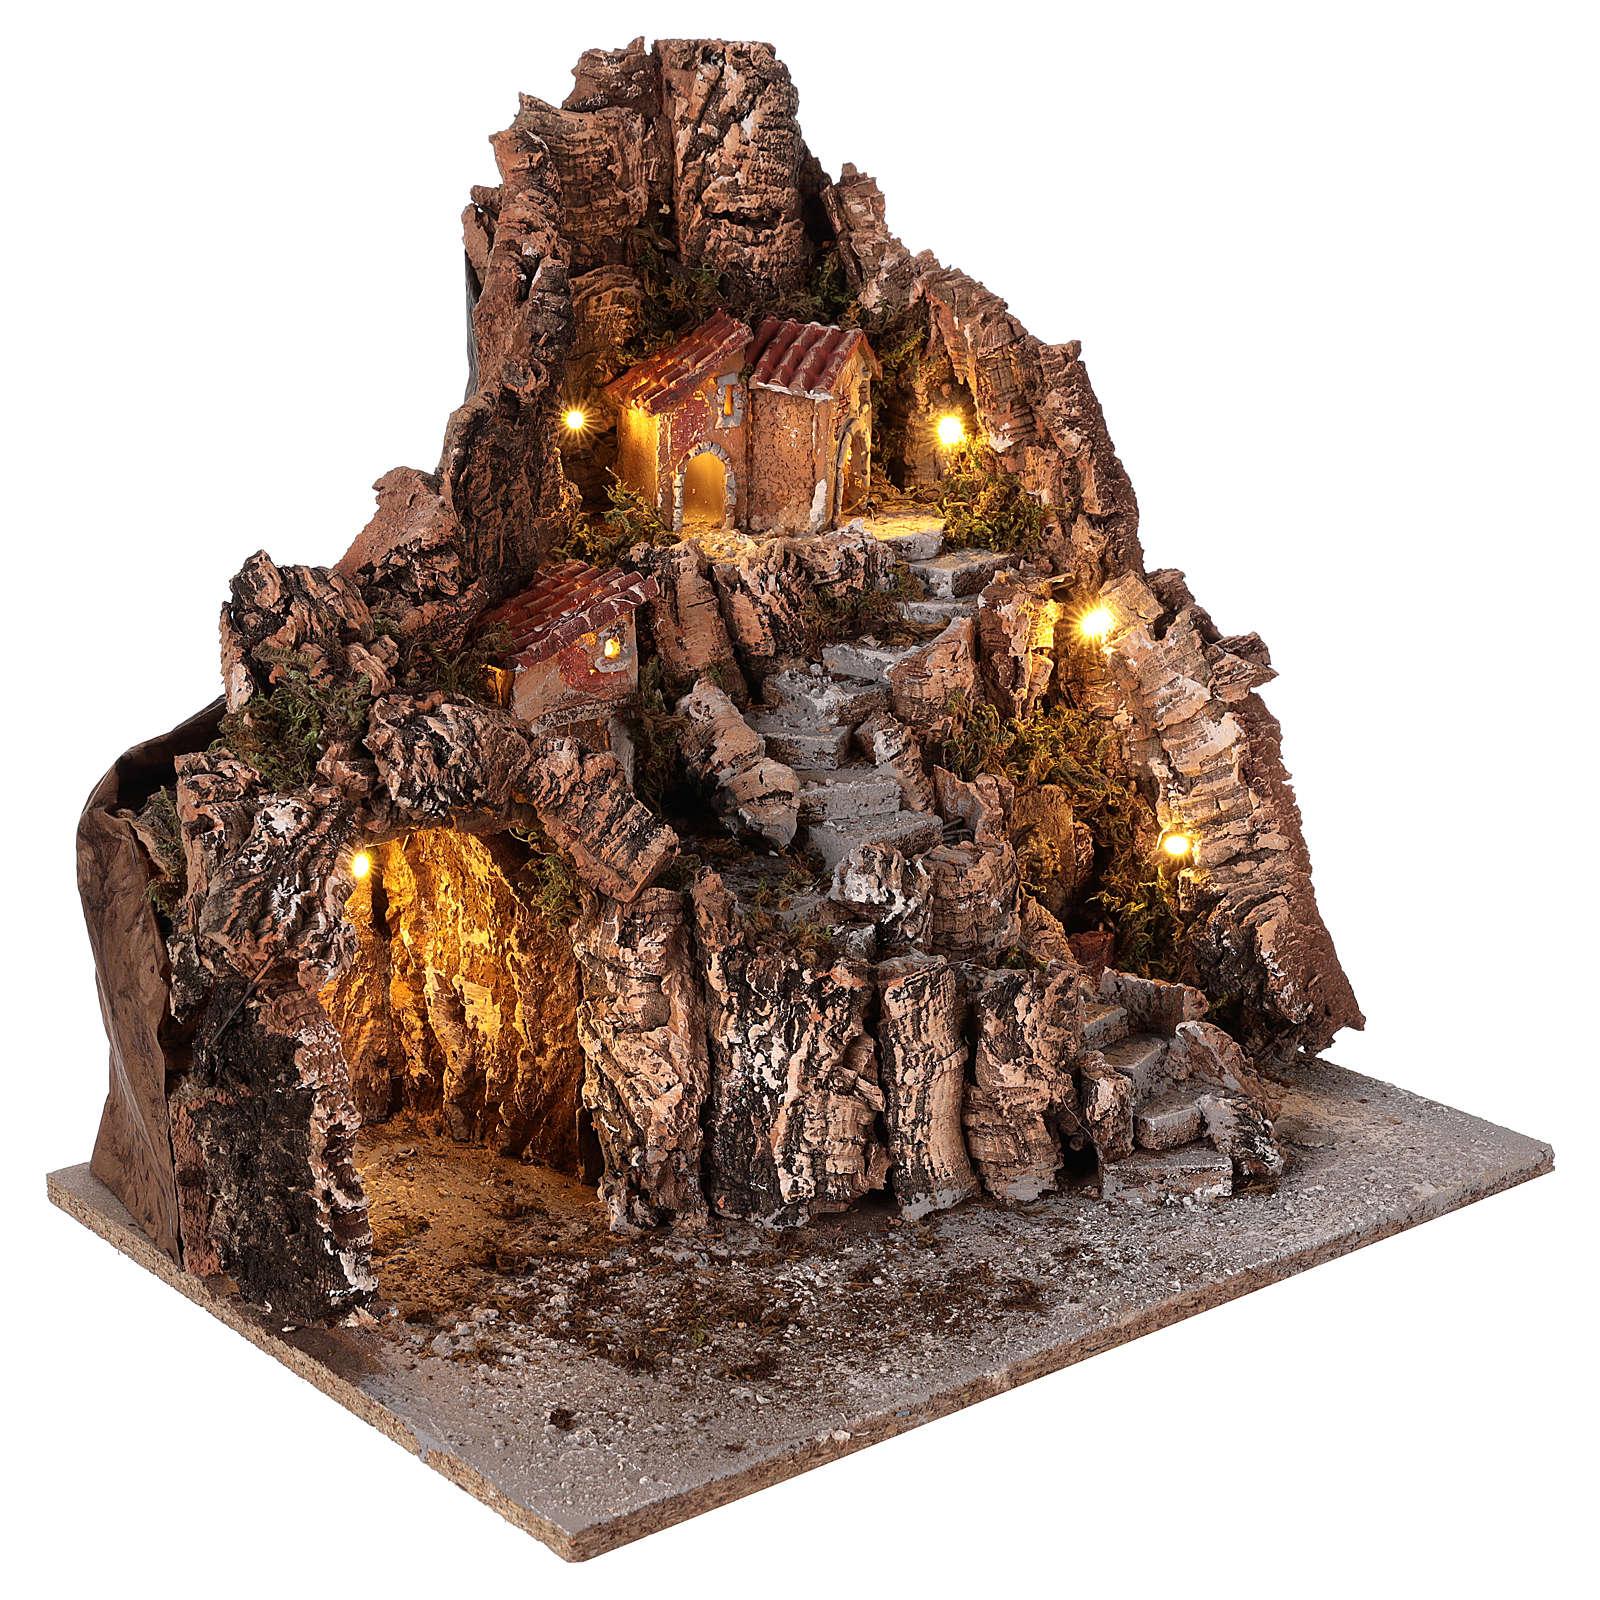 Borgo con grotta fontana presepe napoletano 40x34x40 cm 4